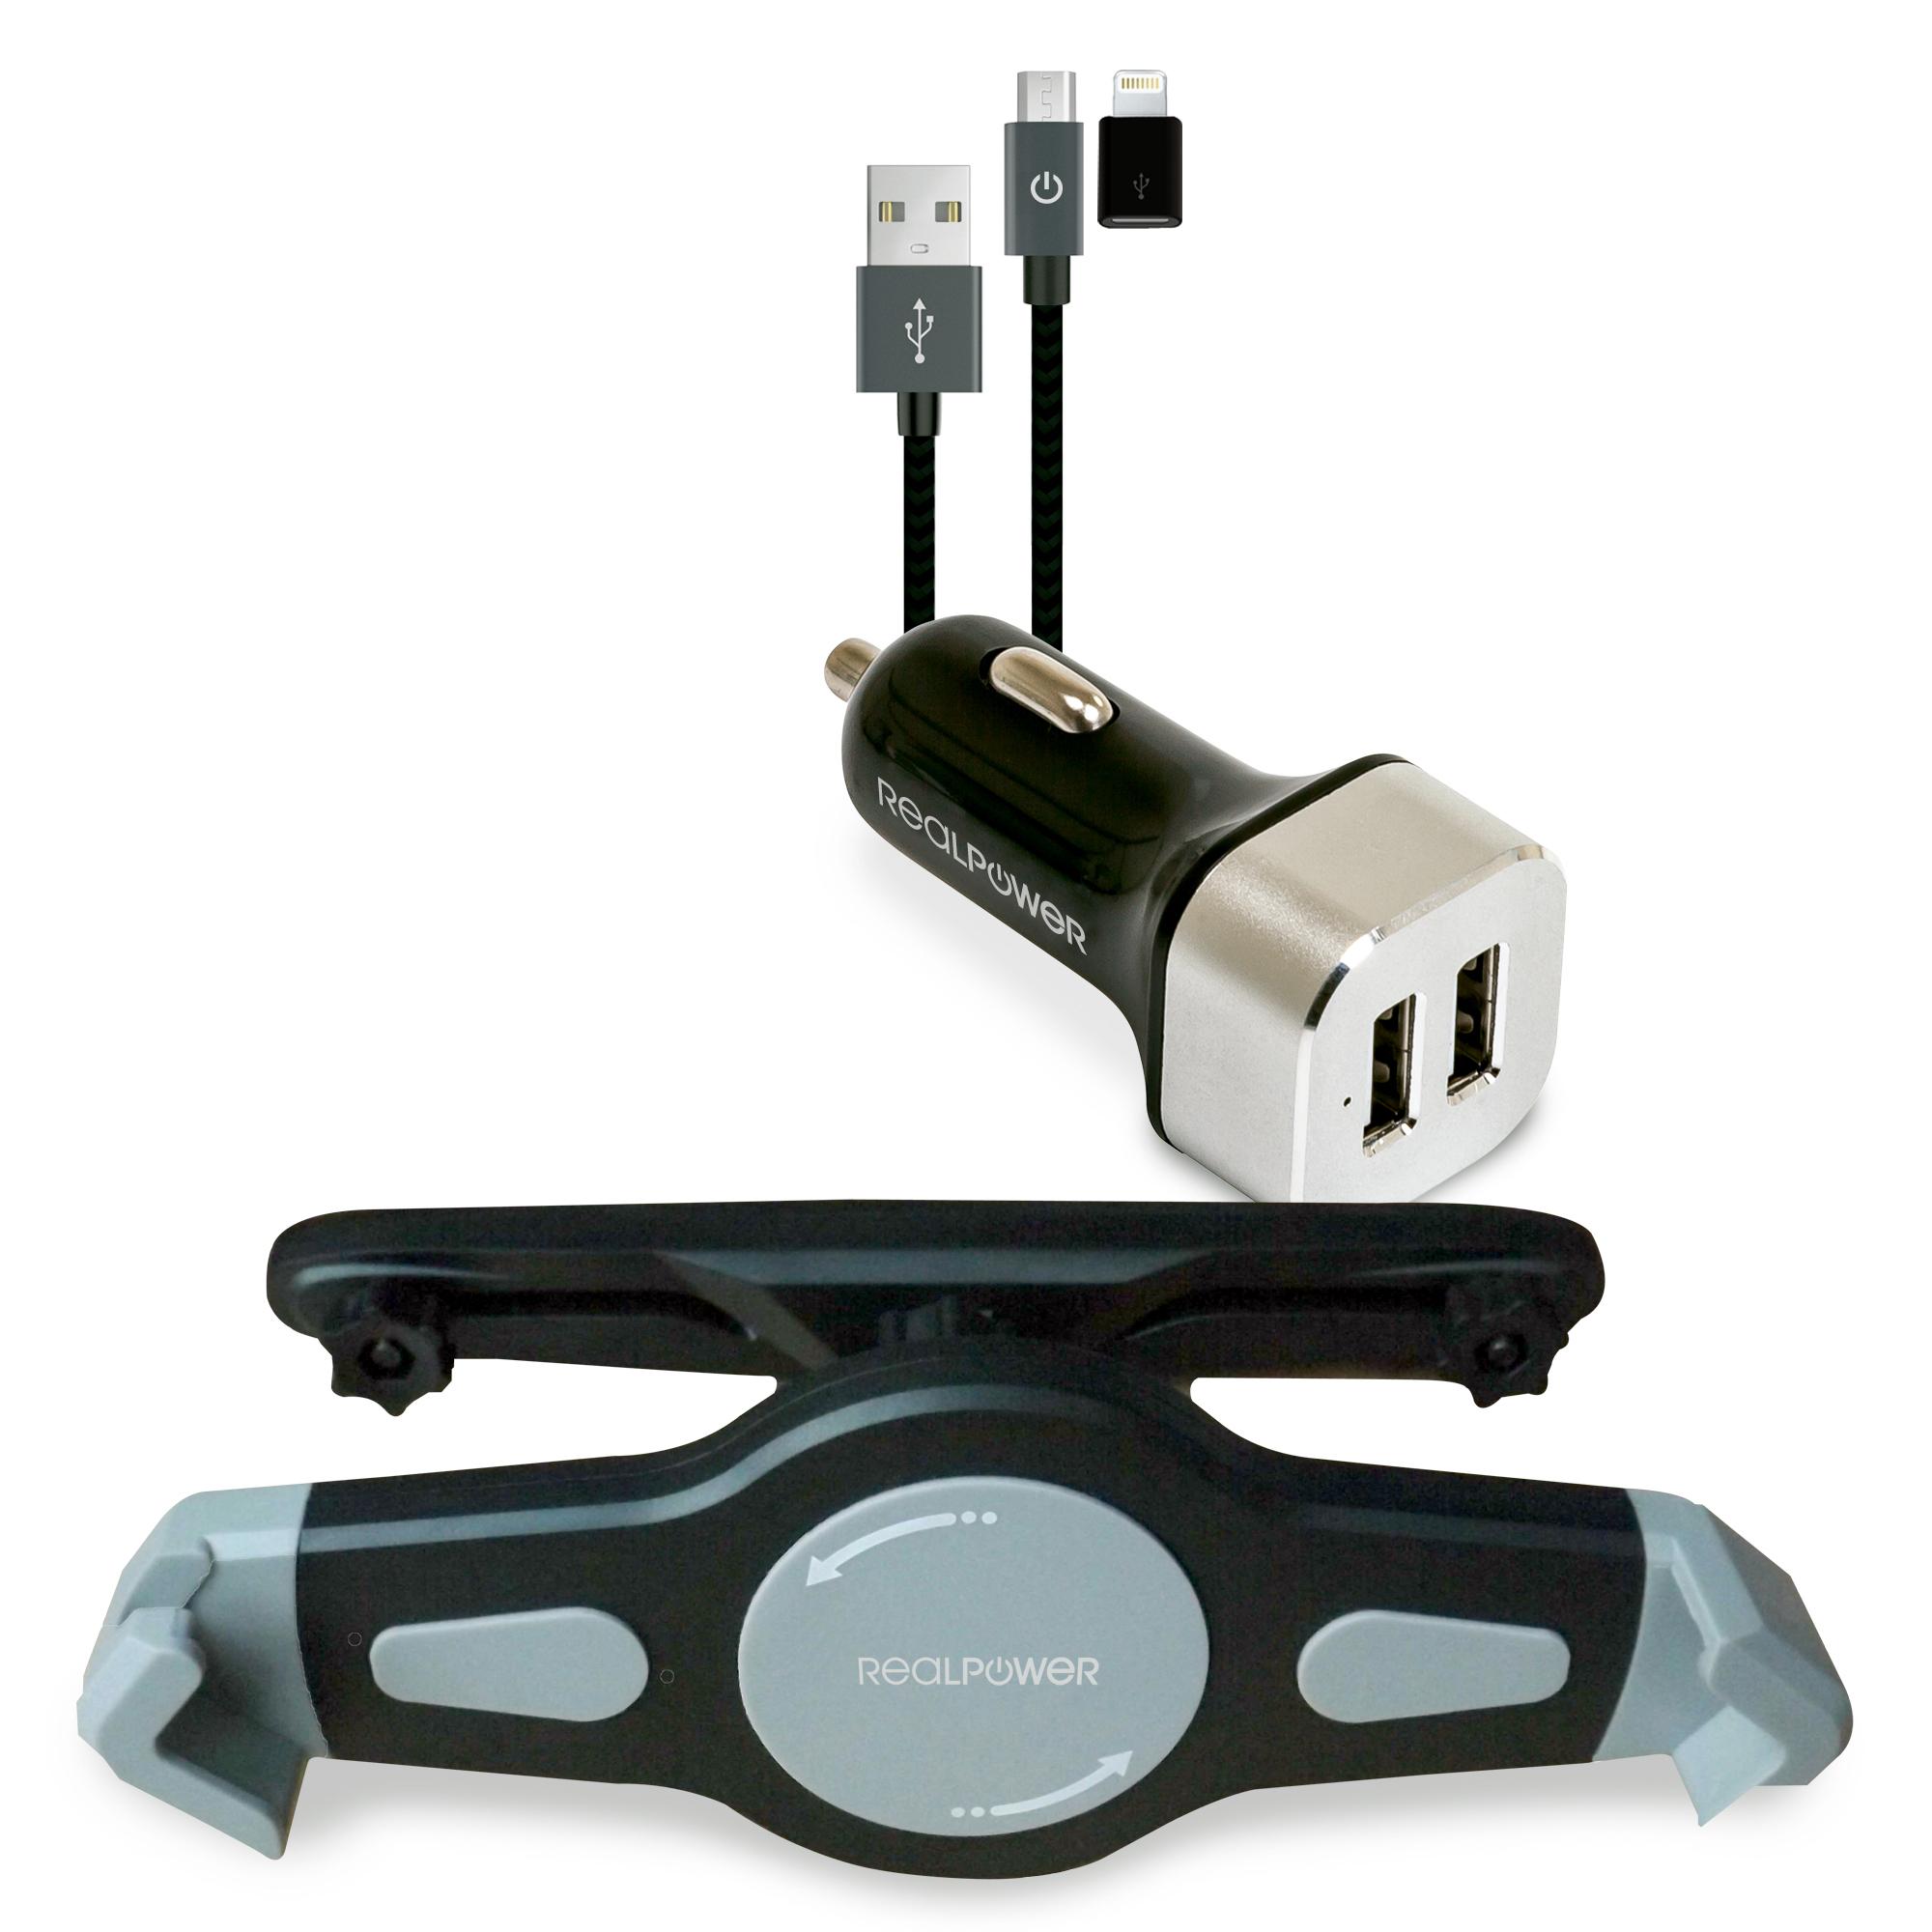 RealPower Tablet Car Set Zubehoer-Set fuer Tablets - Tablet/UMPC - Aktive Halterung - Auto - Schwarz - Silber